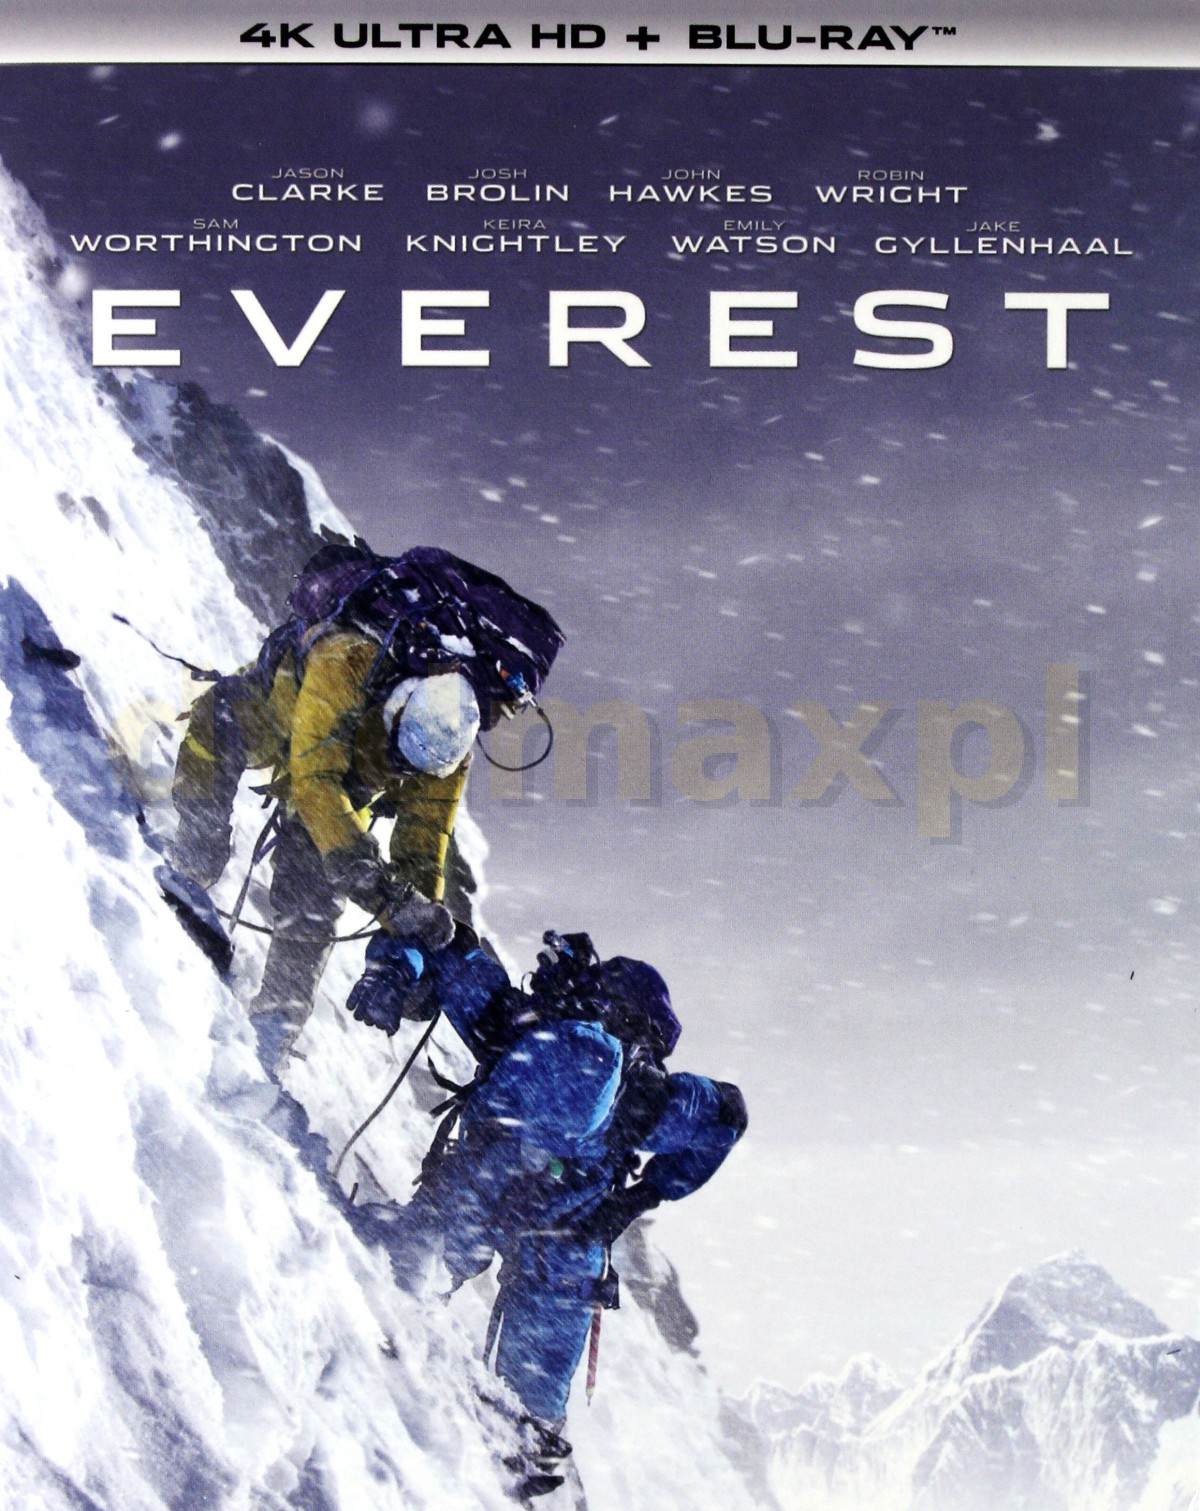 Everest [Blu-Ray 4K]+[Blu-Ray]